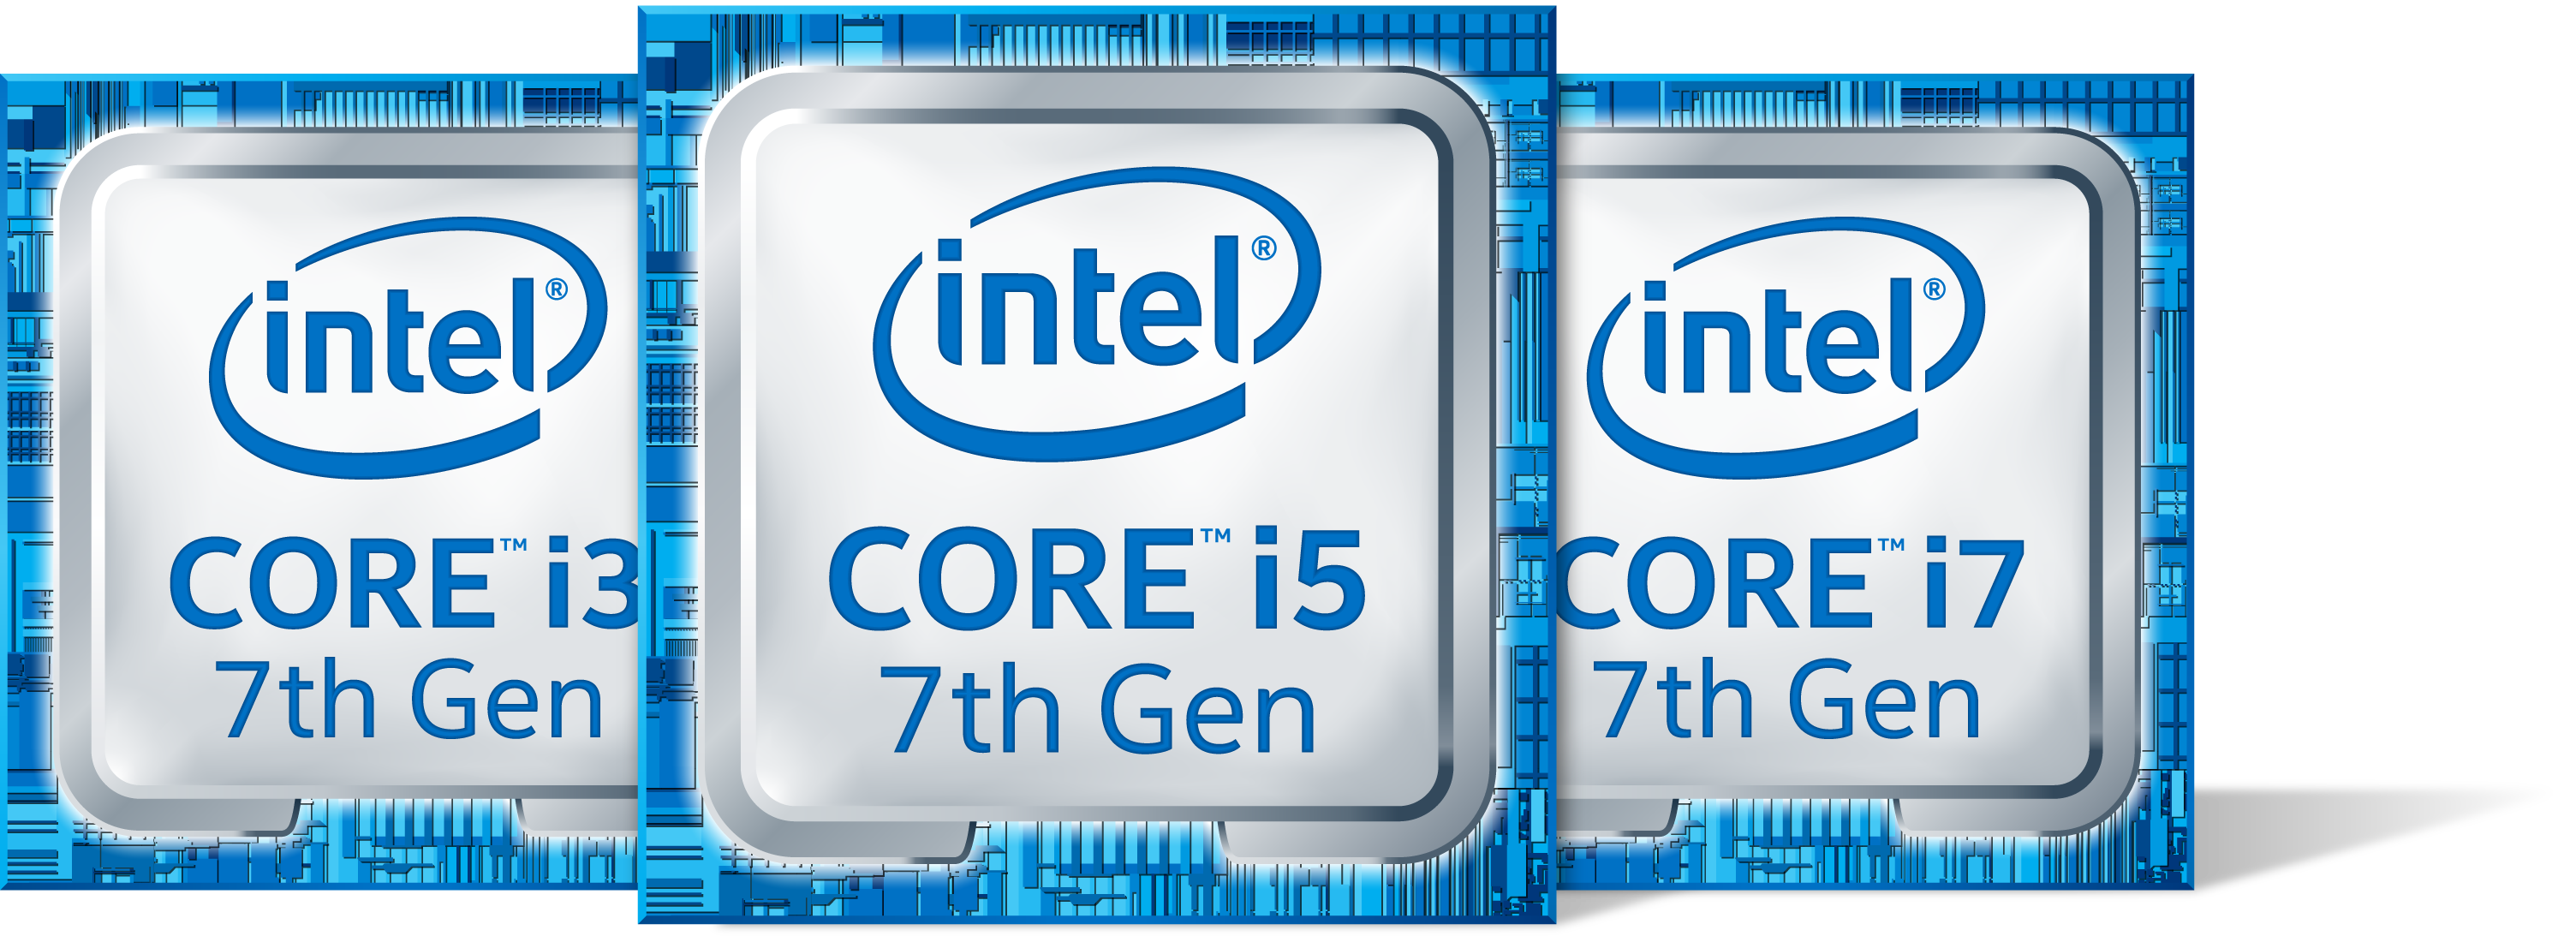 7th Gen Intel Core family